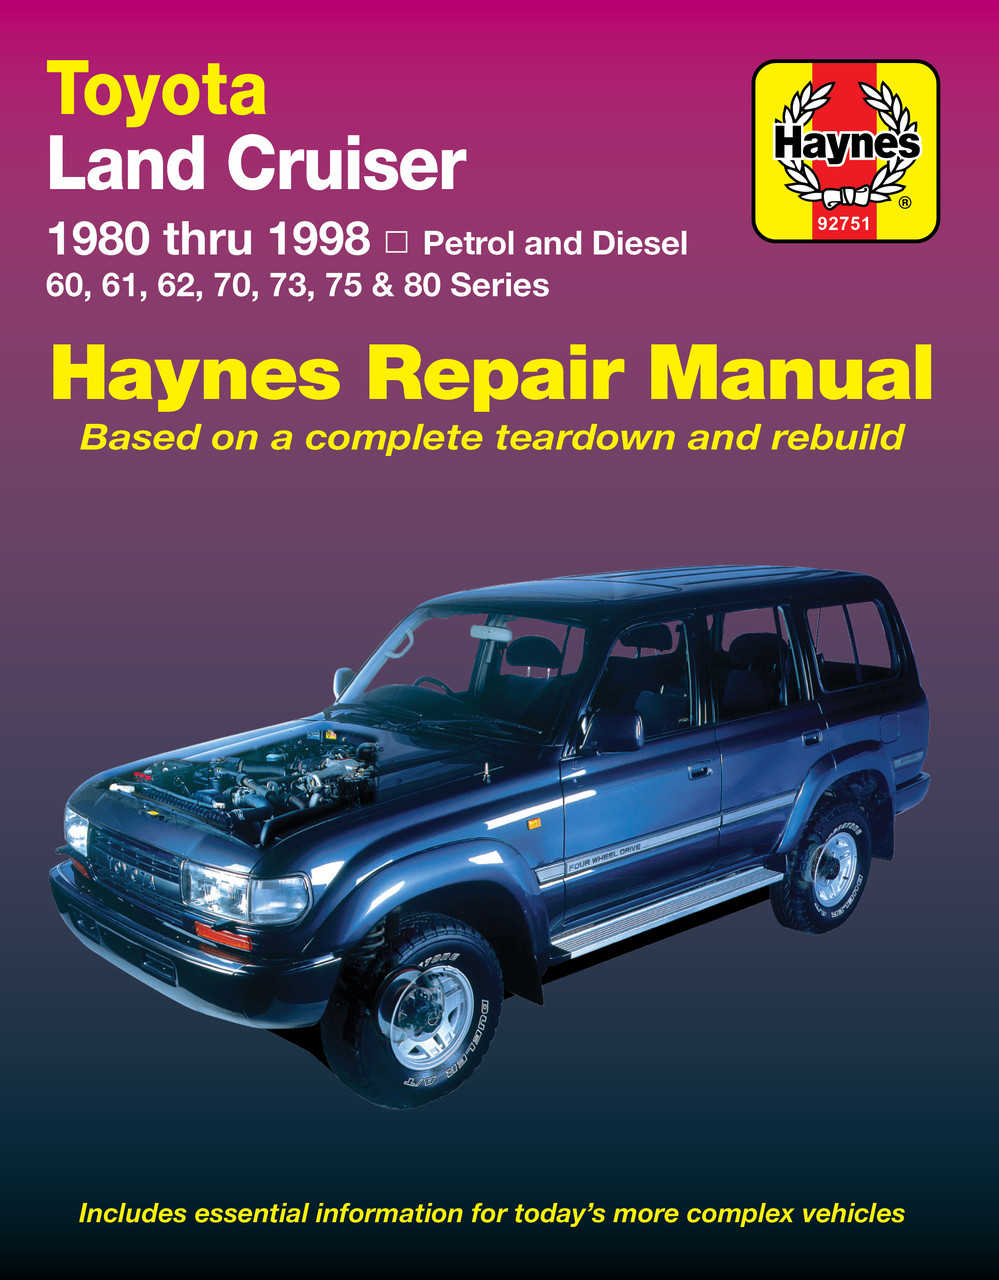 1993 Toyota Land Cruiser Engine Diagram Wiring Diagrams Schematics 1991 Belt Explained Rh Dmdelectro Co Custom 1997